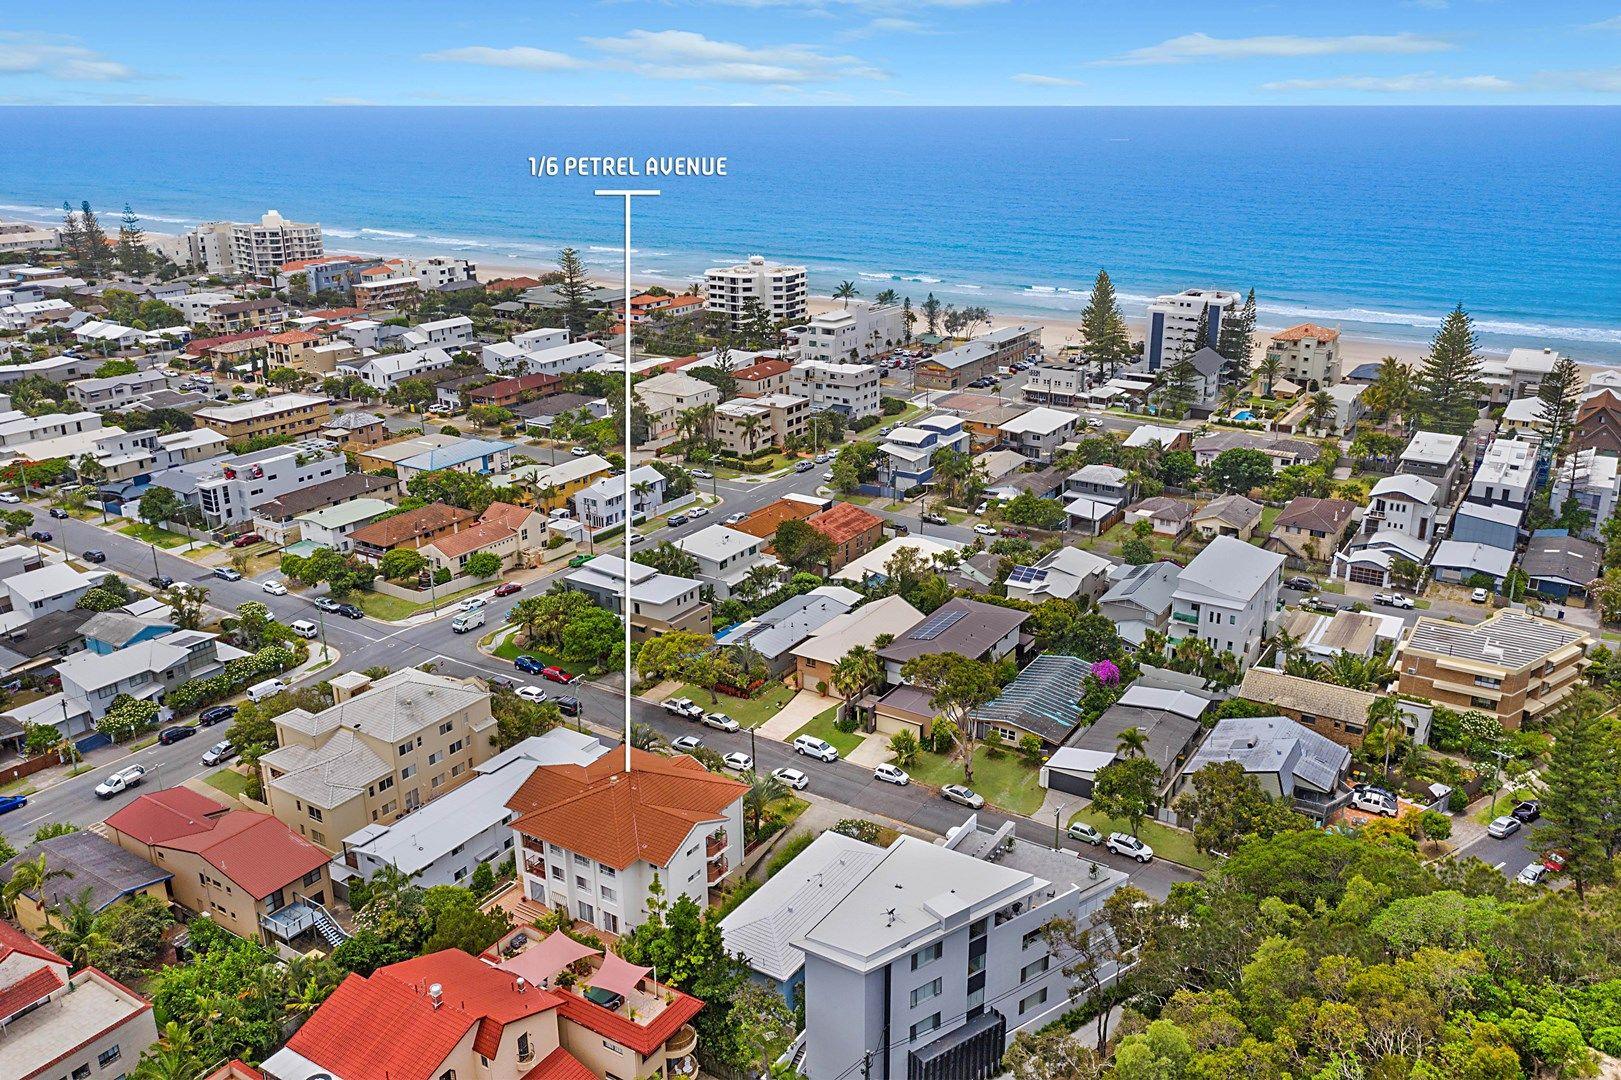 Unit 1/6 - 8 Petrel Avenue, Mermaid Beach QLD 4218, Image 0